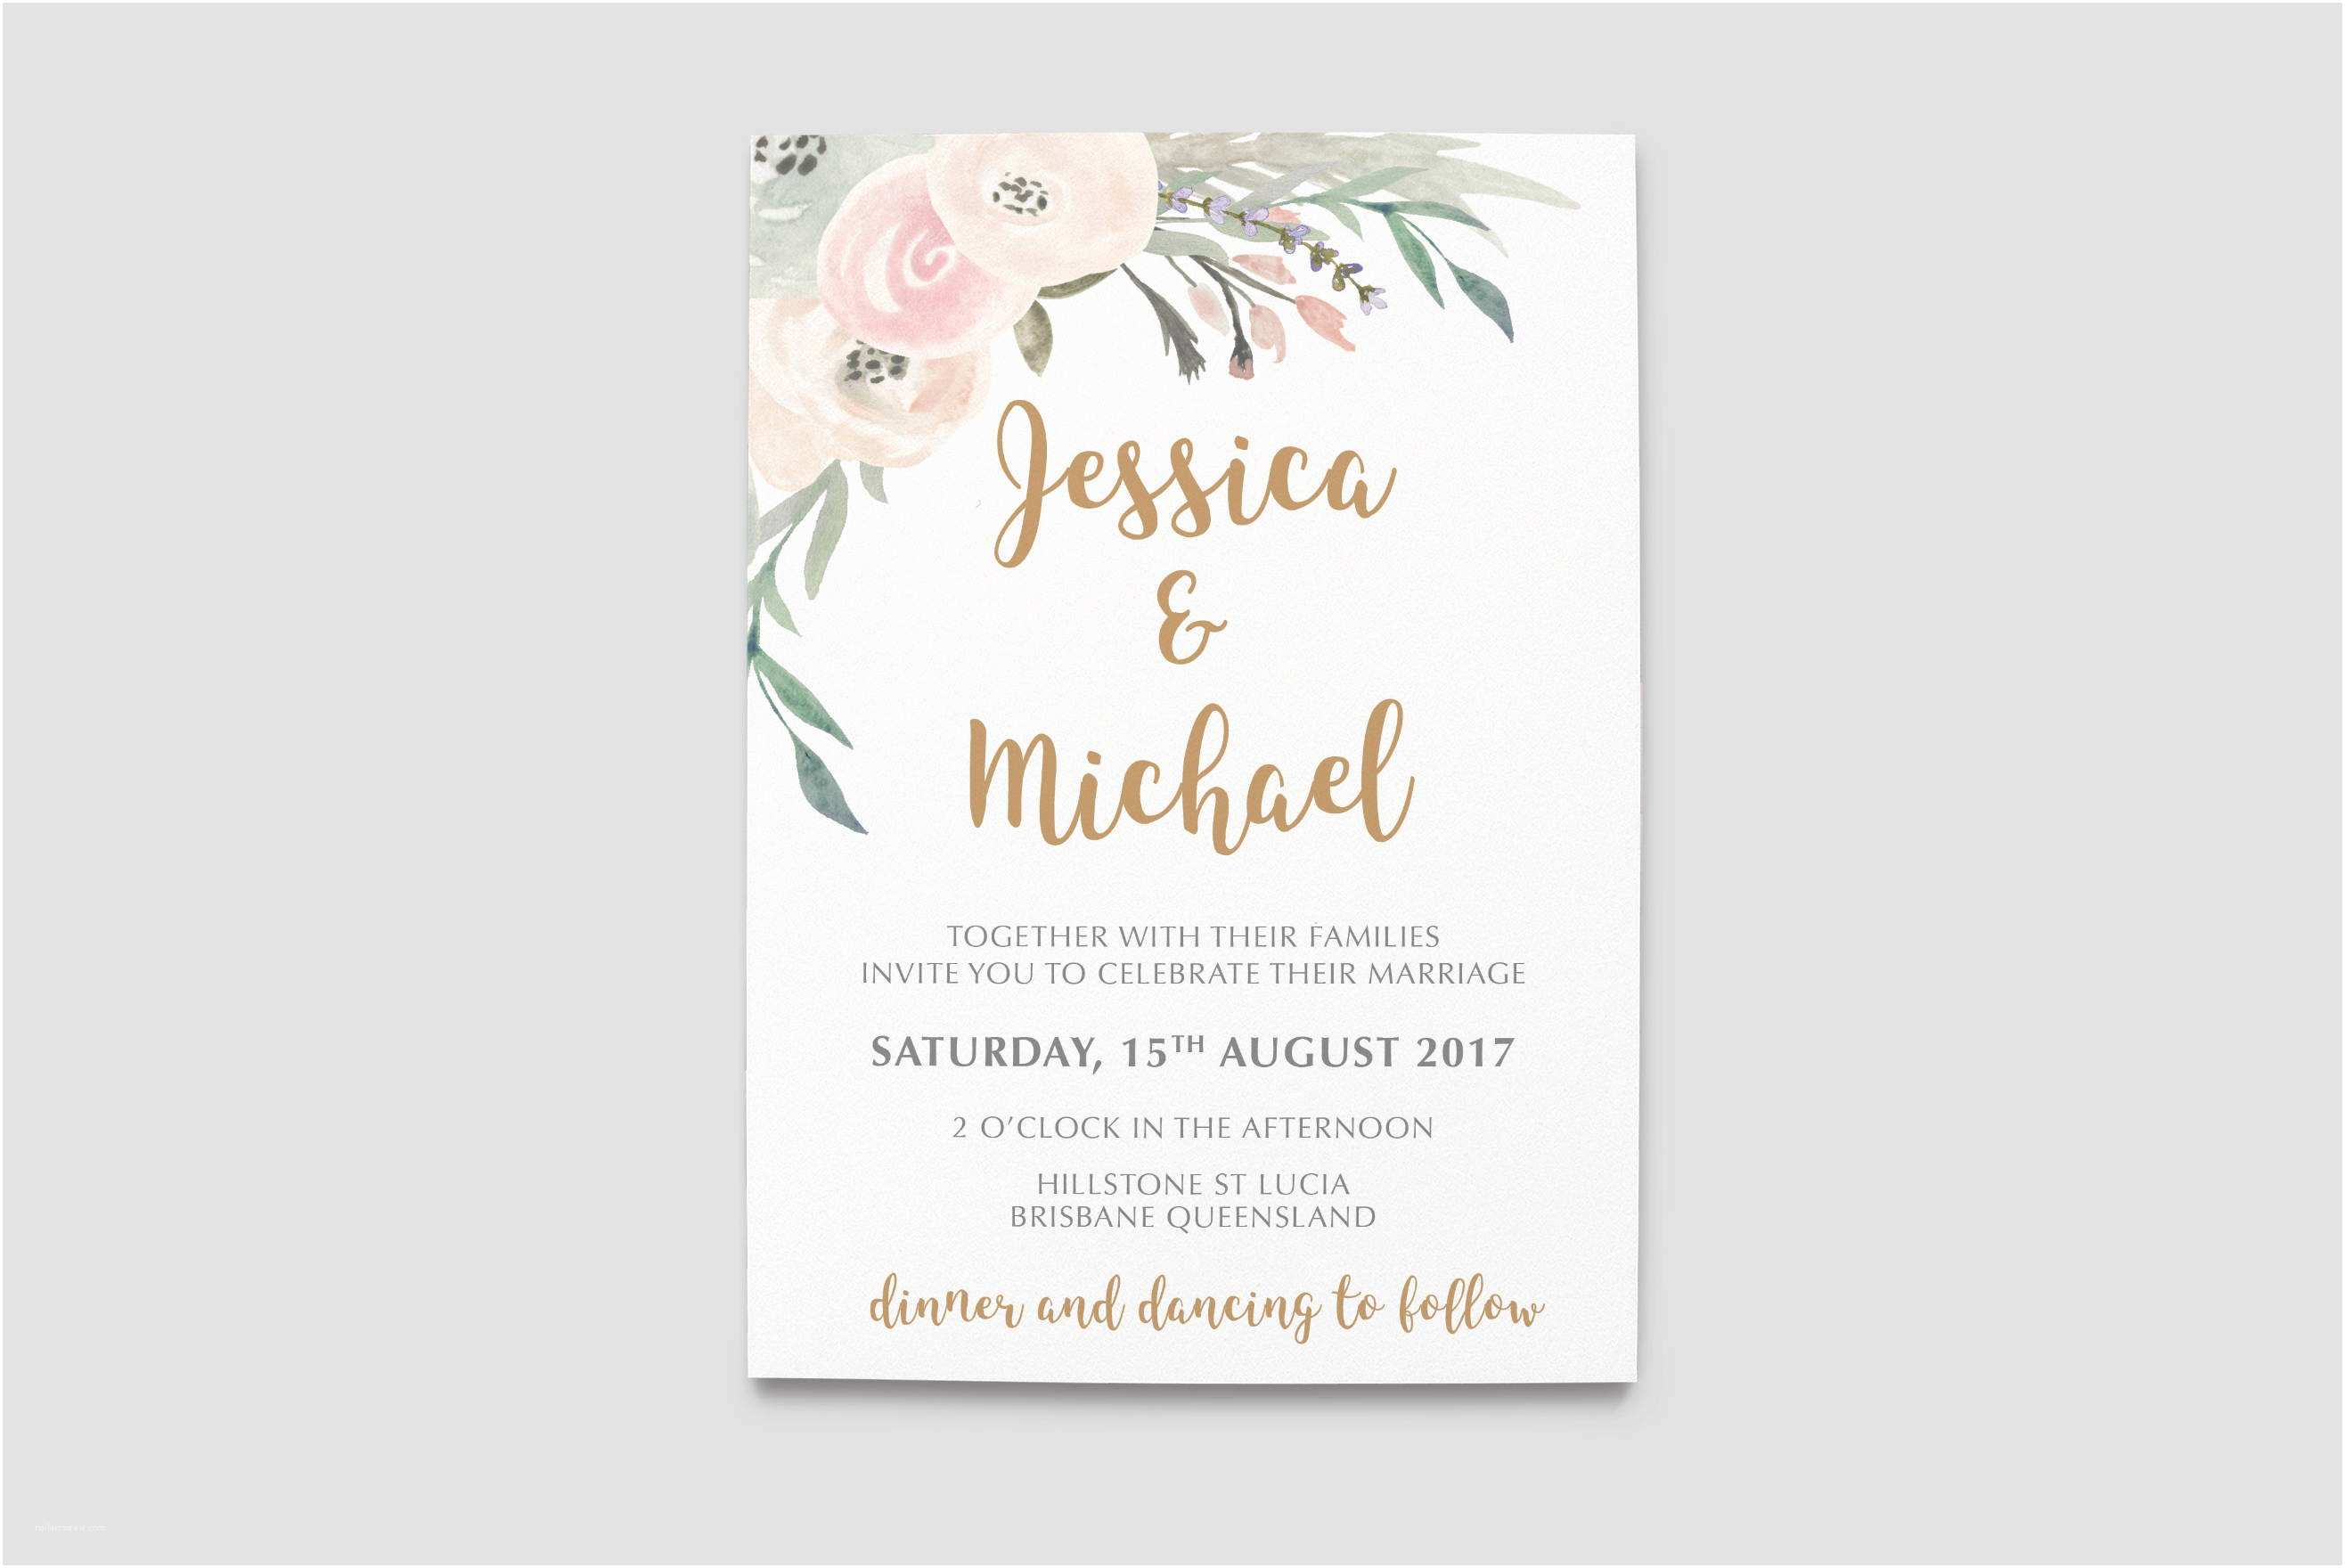 Lace Wedding Invitations Vistaprint Vistaprint Wedding Invitations Reviews Uk Yaseen for